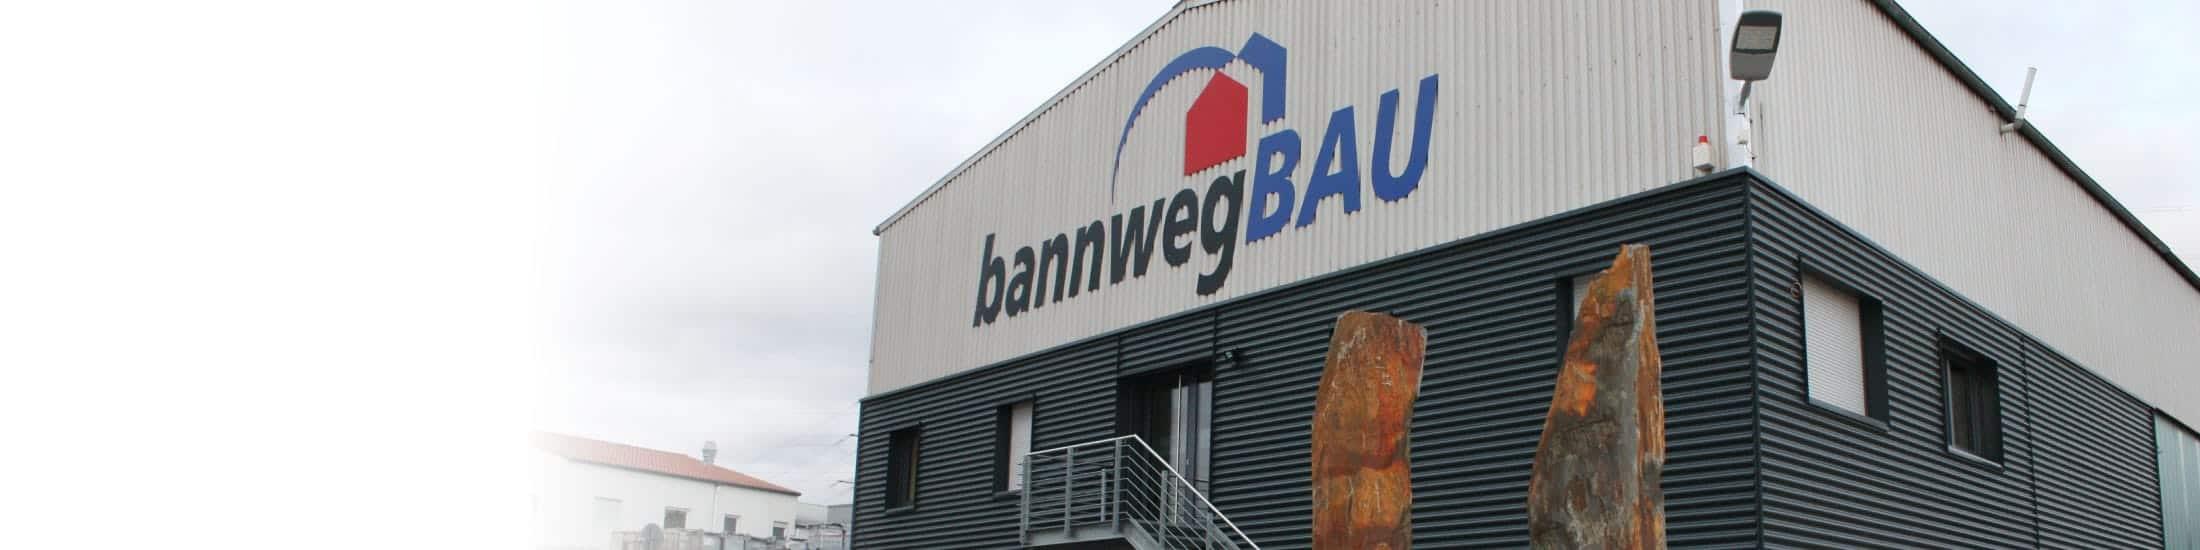 Bannweg Bau, Bauunternehmen Saarlouis